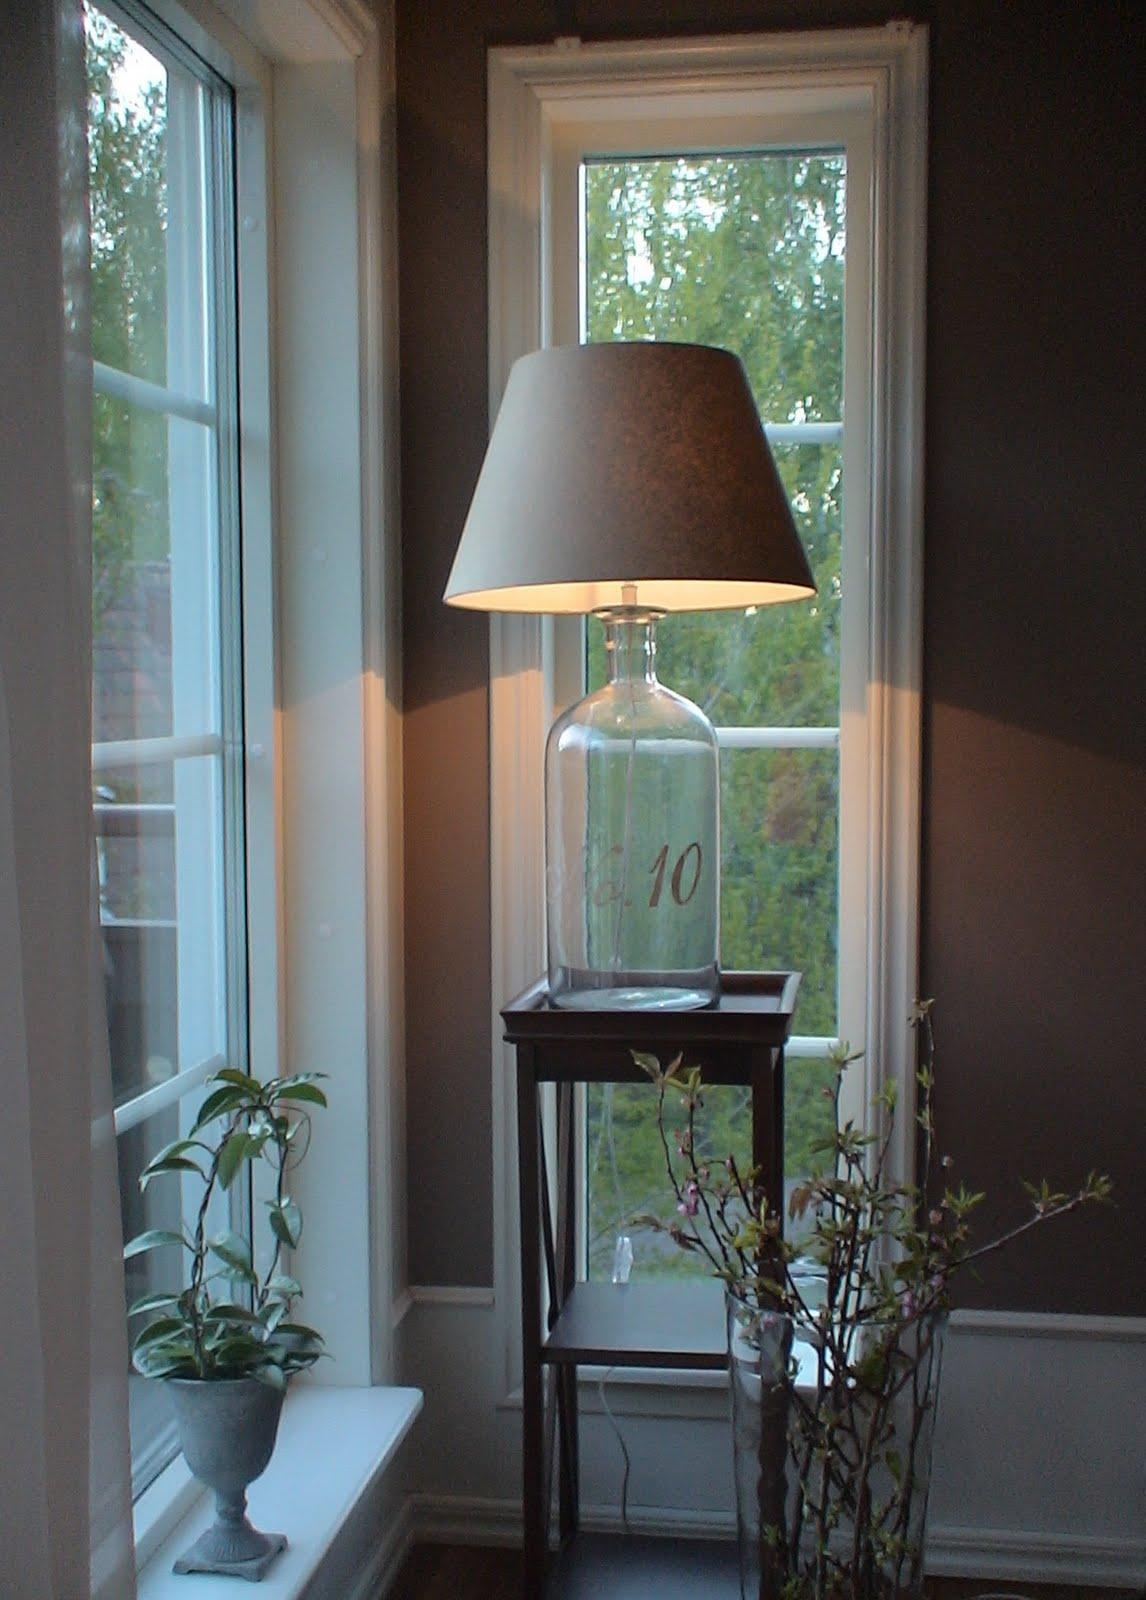 weranna 39 s lightning table and floor lamps. Black Bedroom Furniture Sets. Home Design Ideas